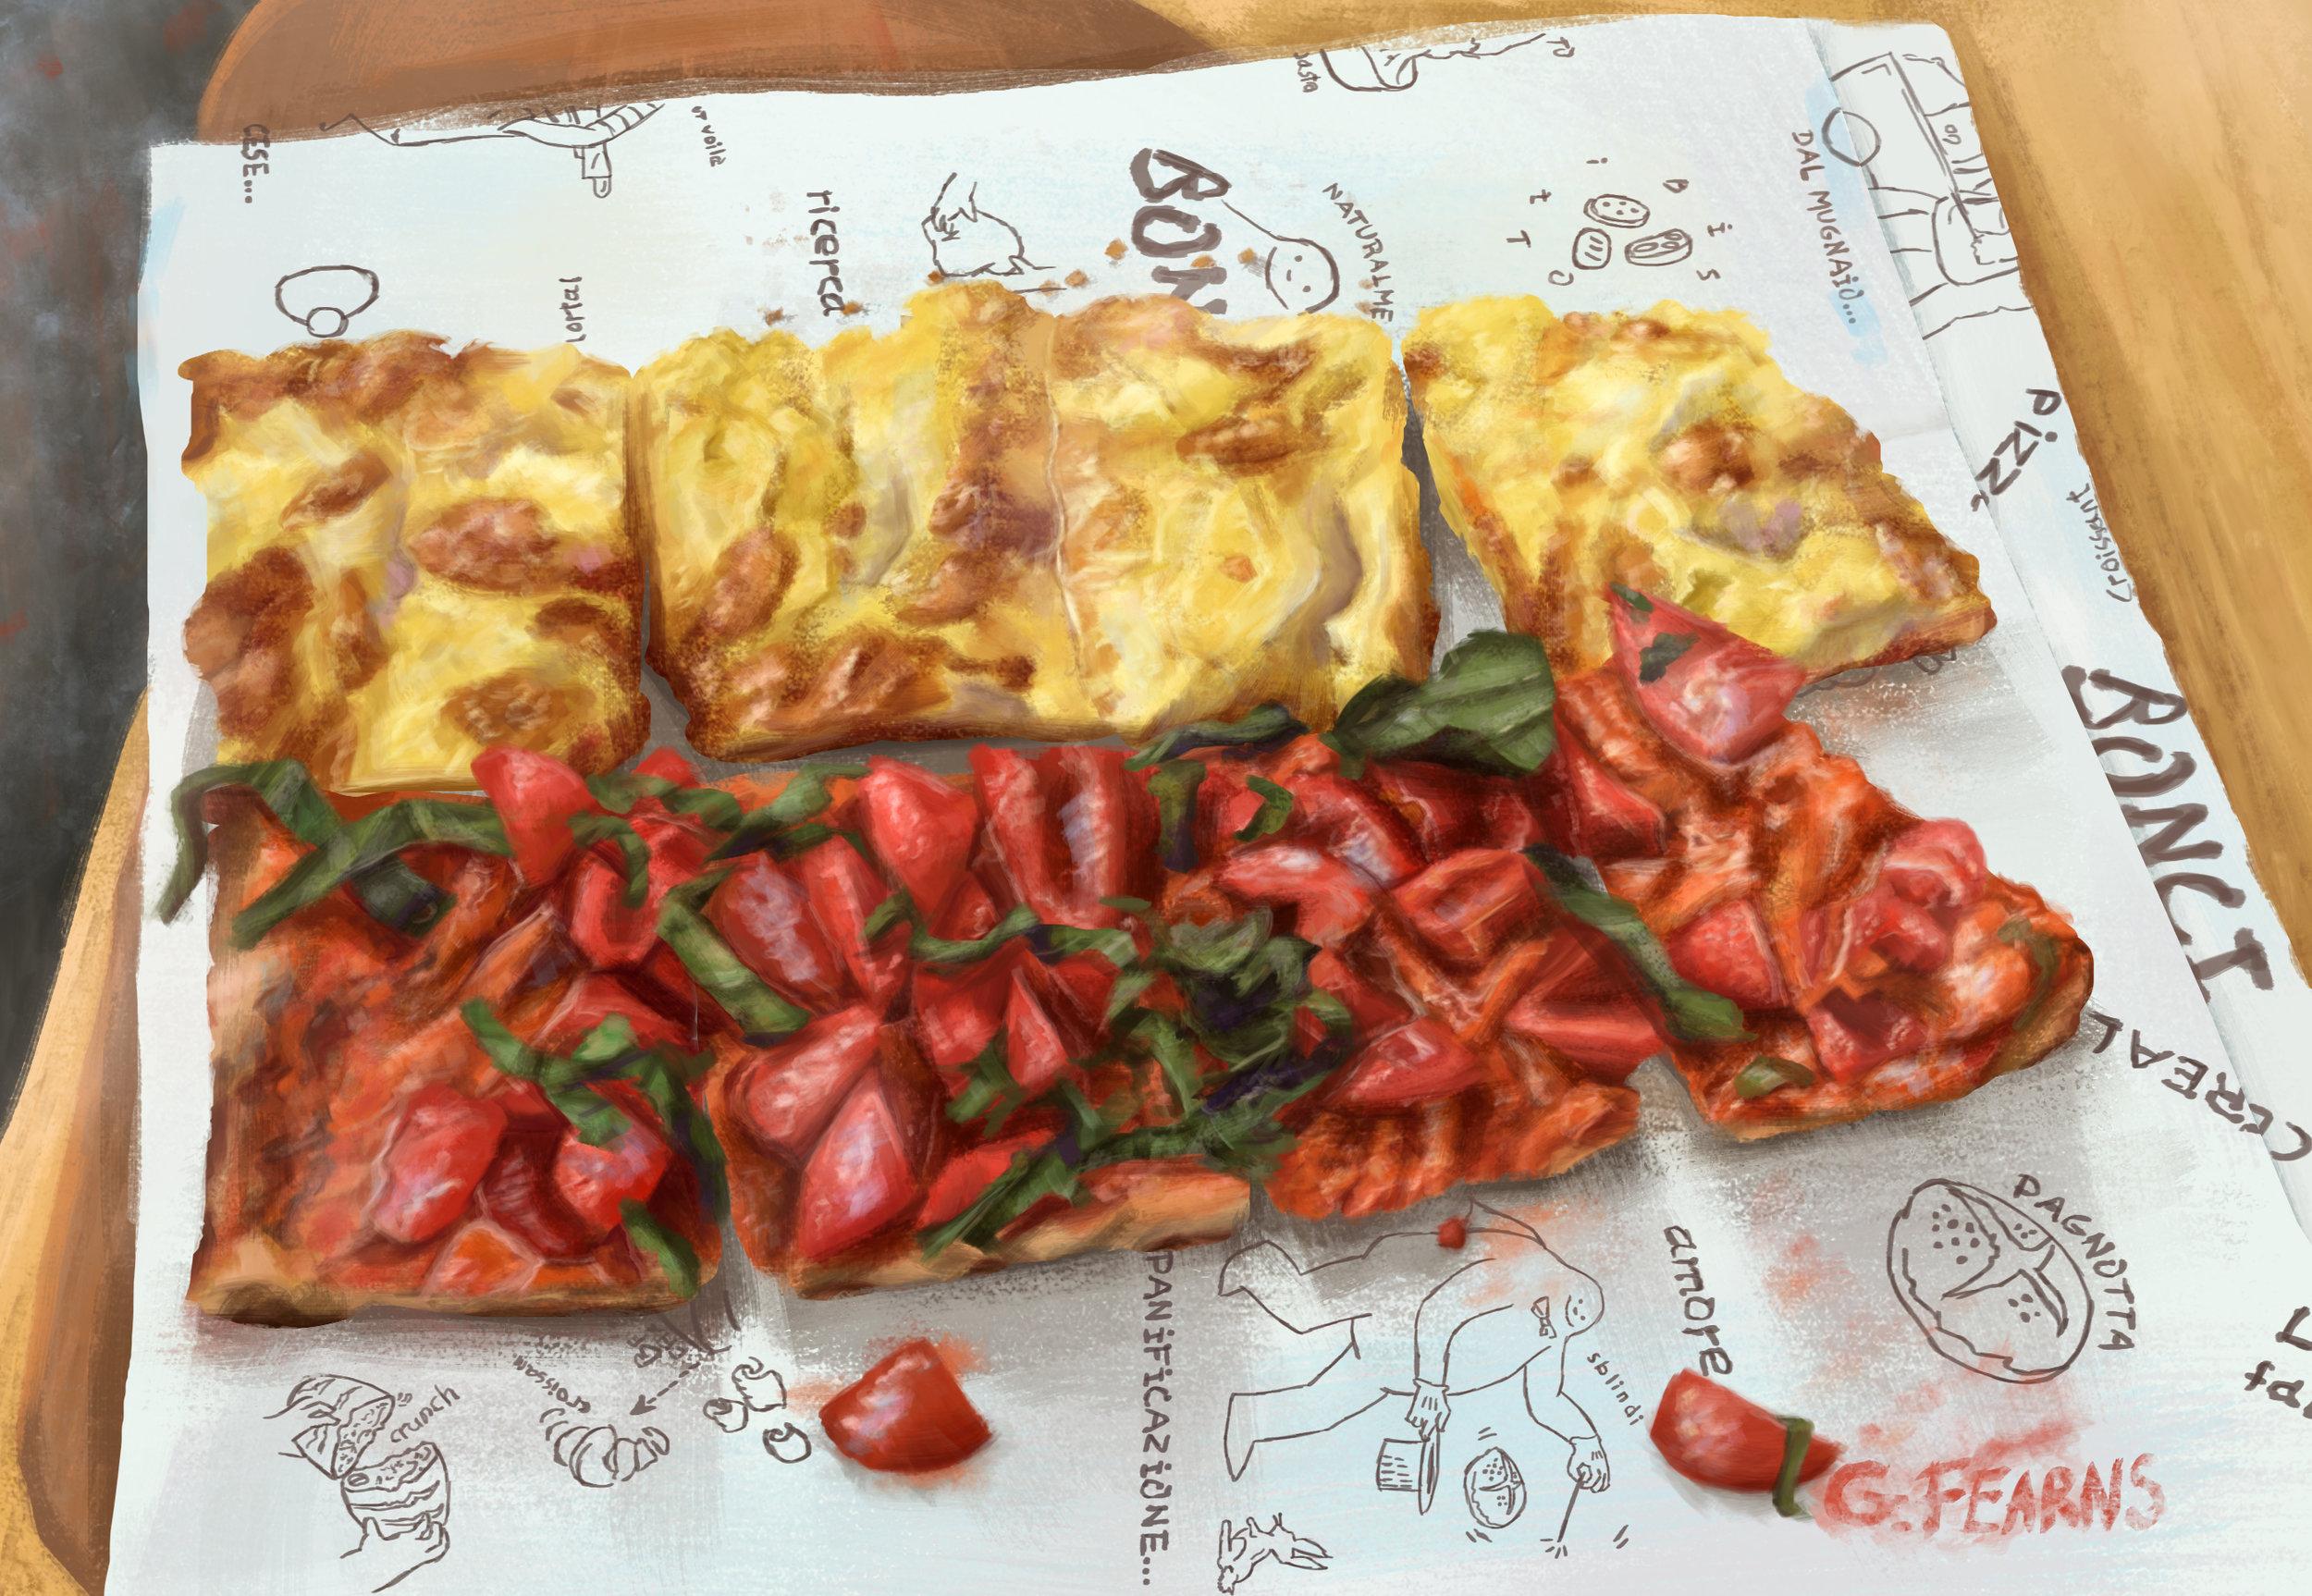 Pizza_Bonci10-21.jpg